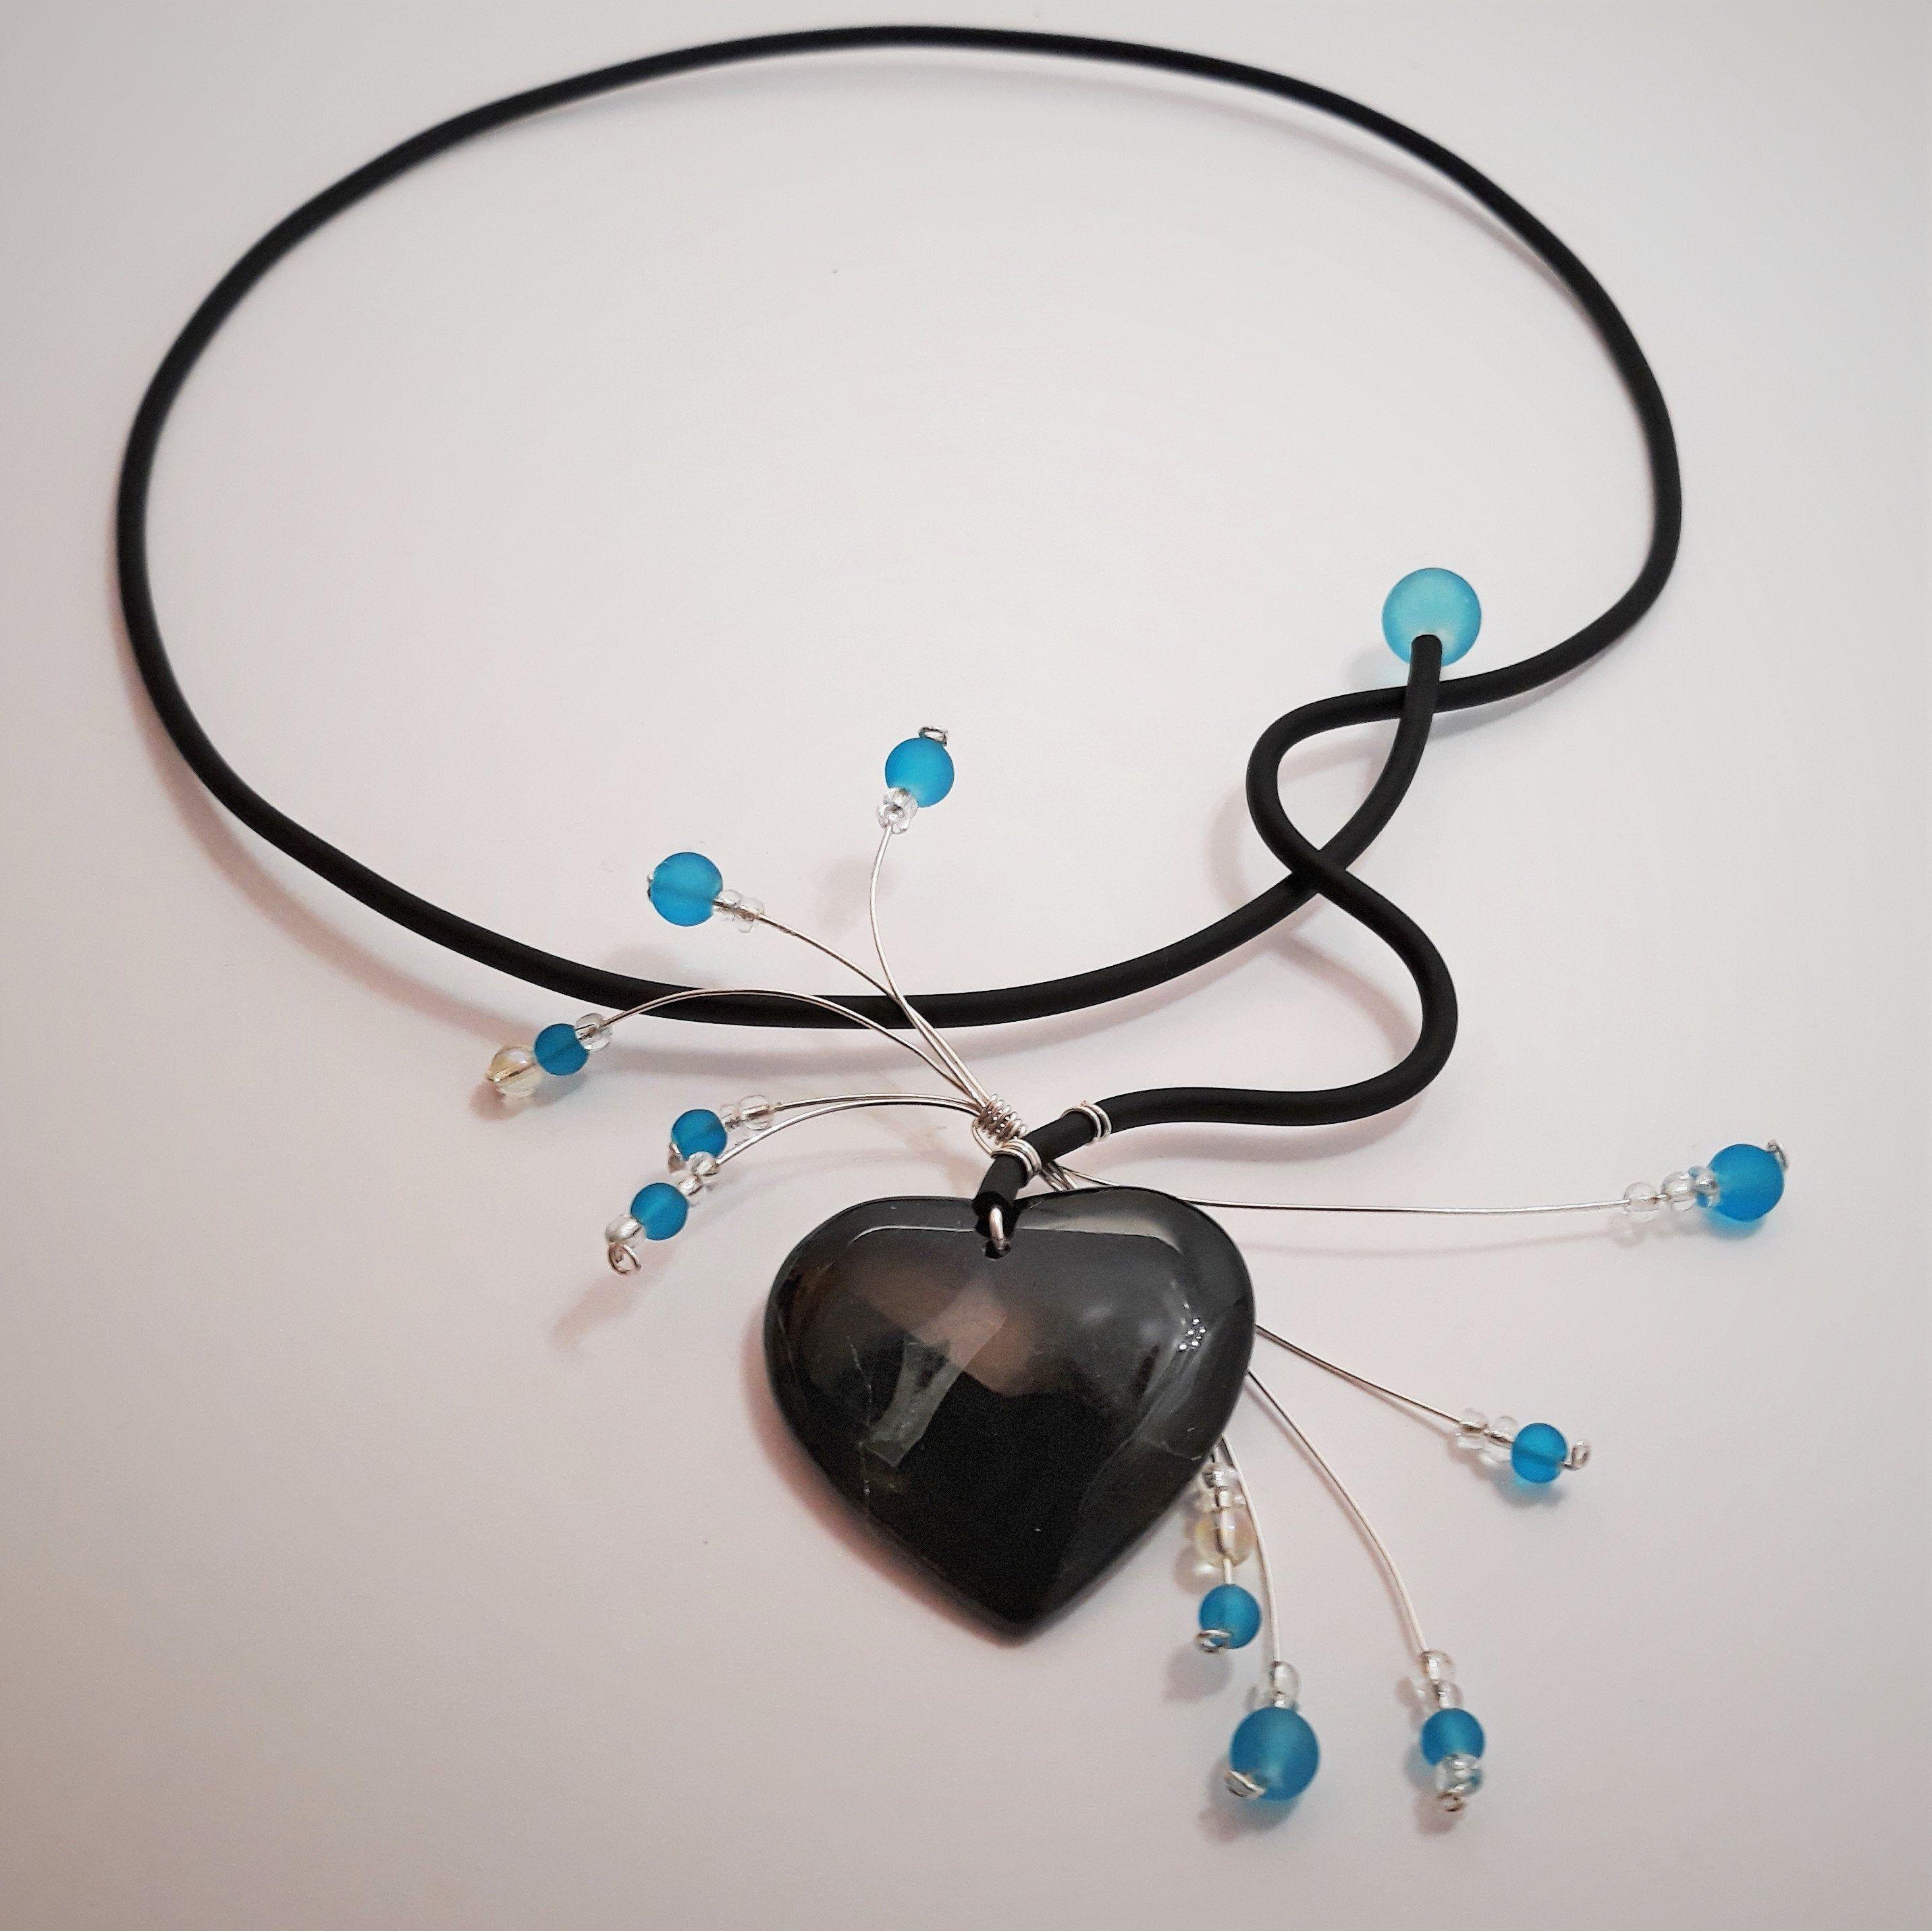 Blue necklace Contemporary jewelry set Polymer clay necklace contemporary statement necklace /& earrings set choker necklace